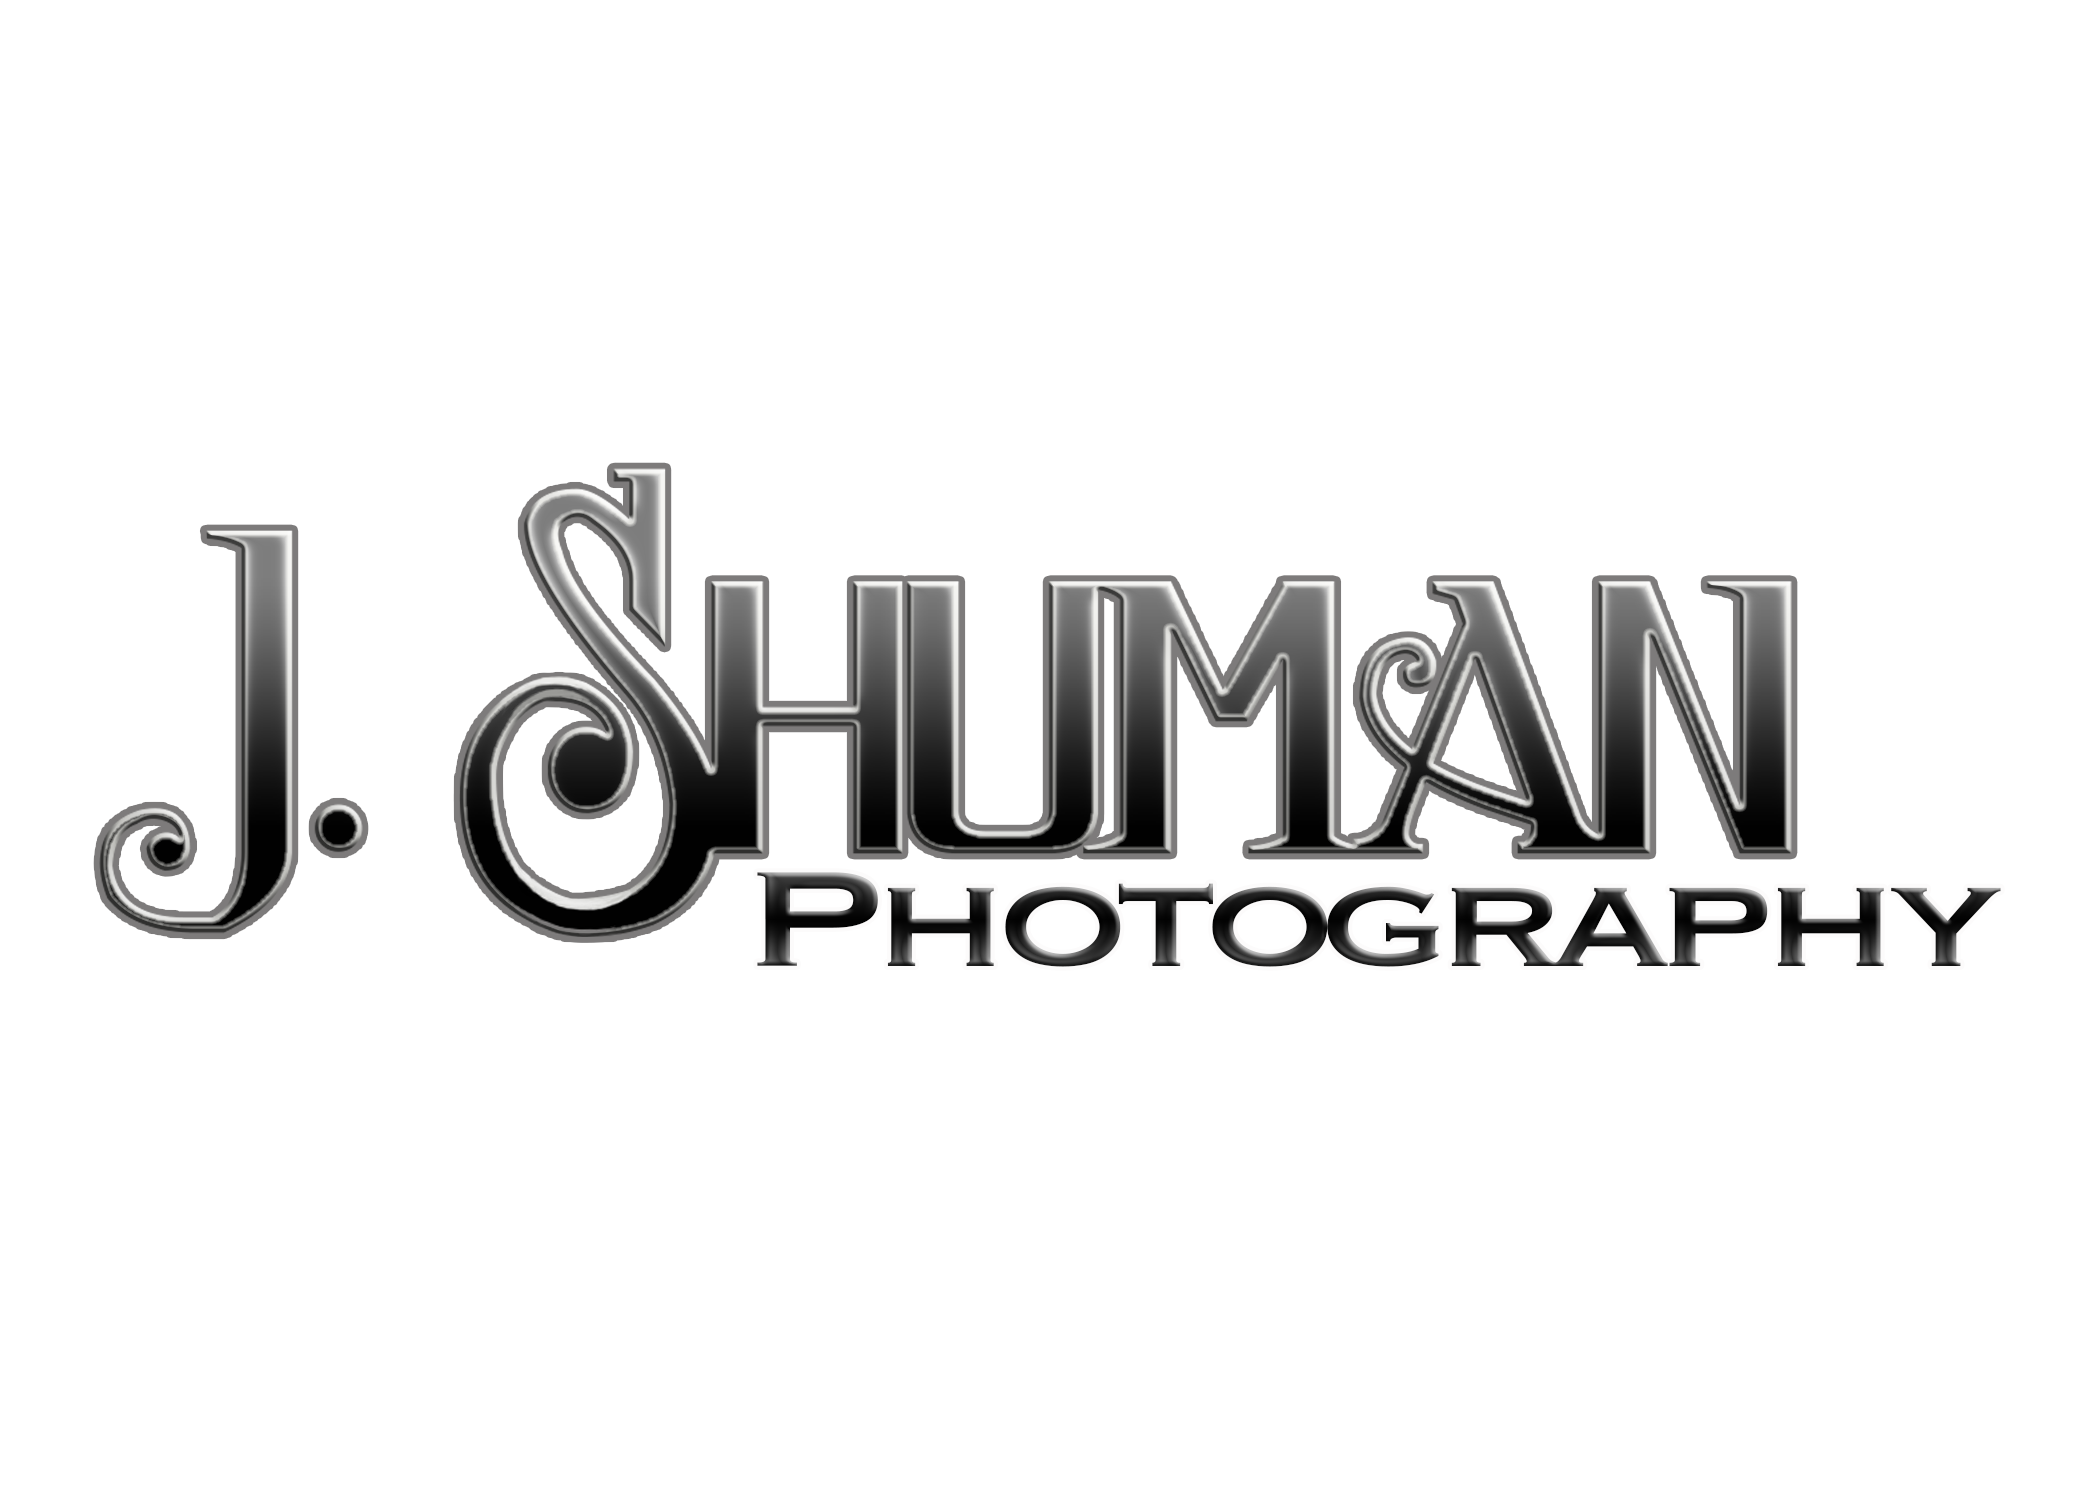 J. Shuman Photography 2017